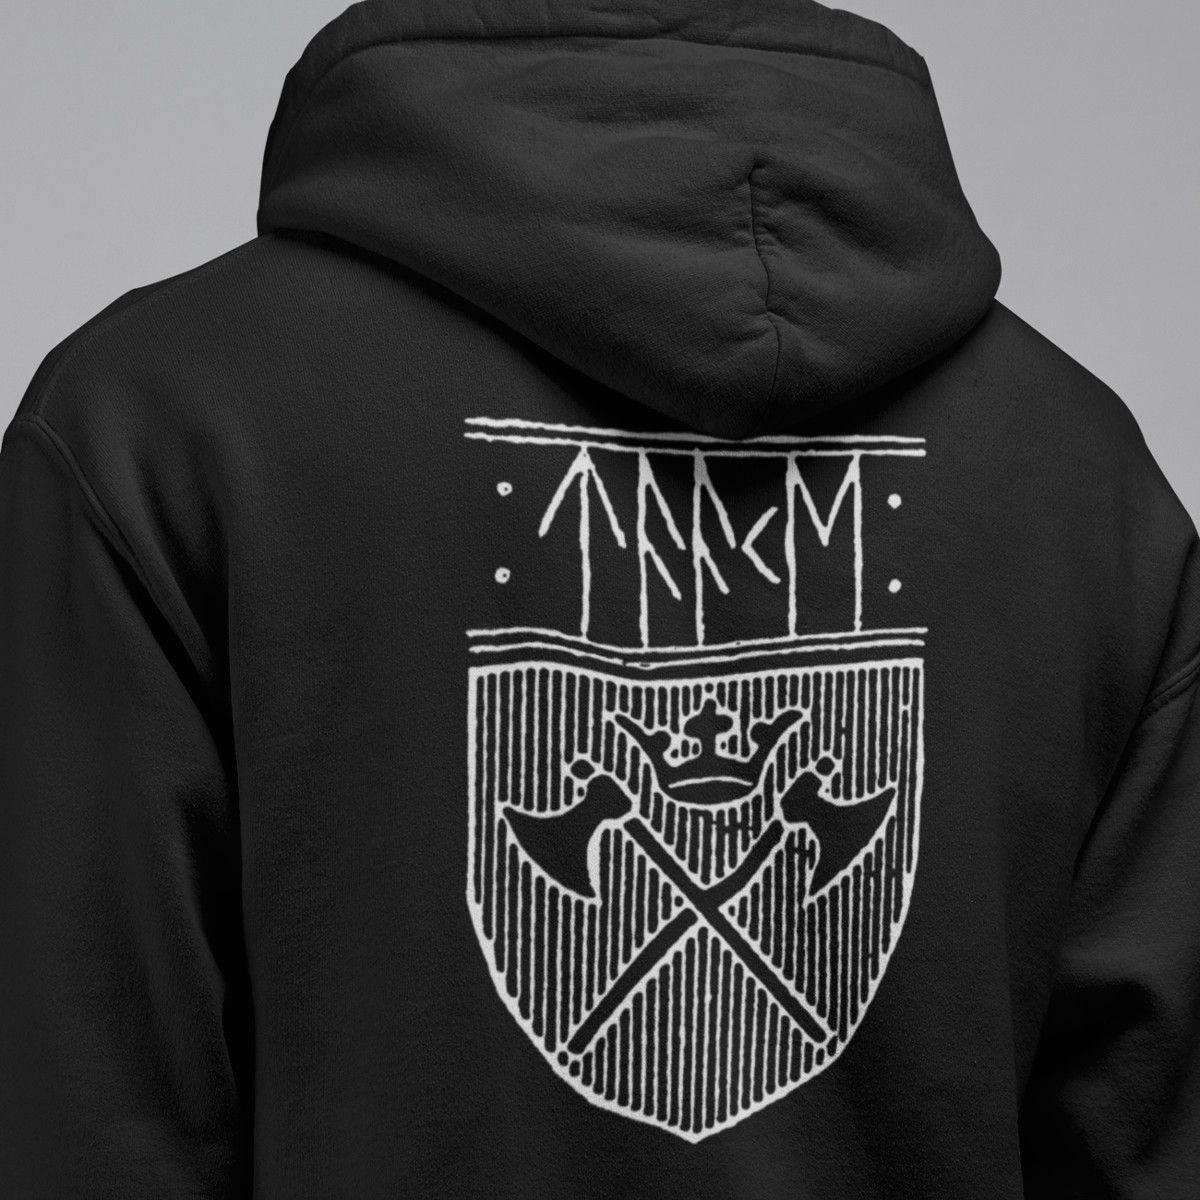 567c7307 Taake Band Hoodie, Taake Logo Hooded Sweatshirt, Black Metal Merch ...